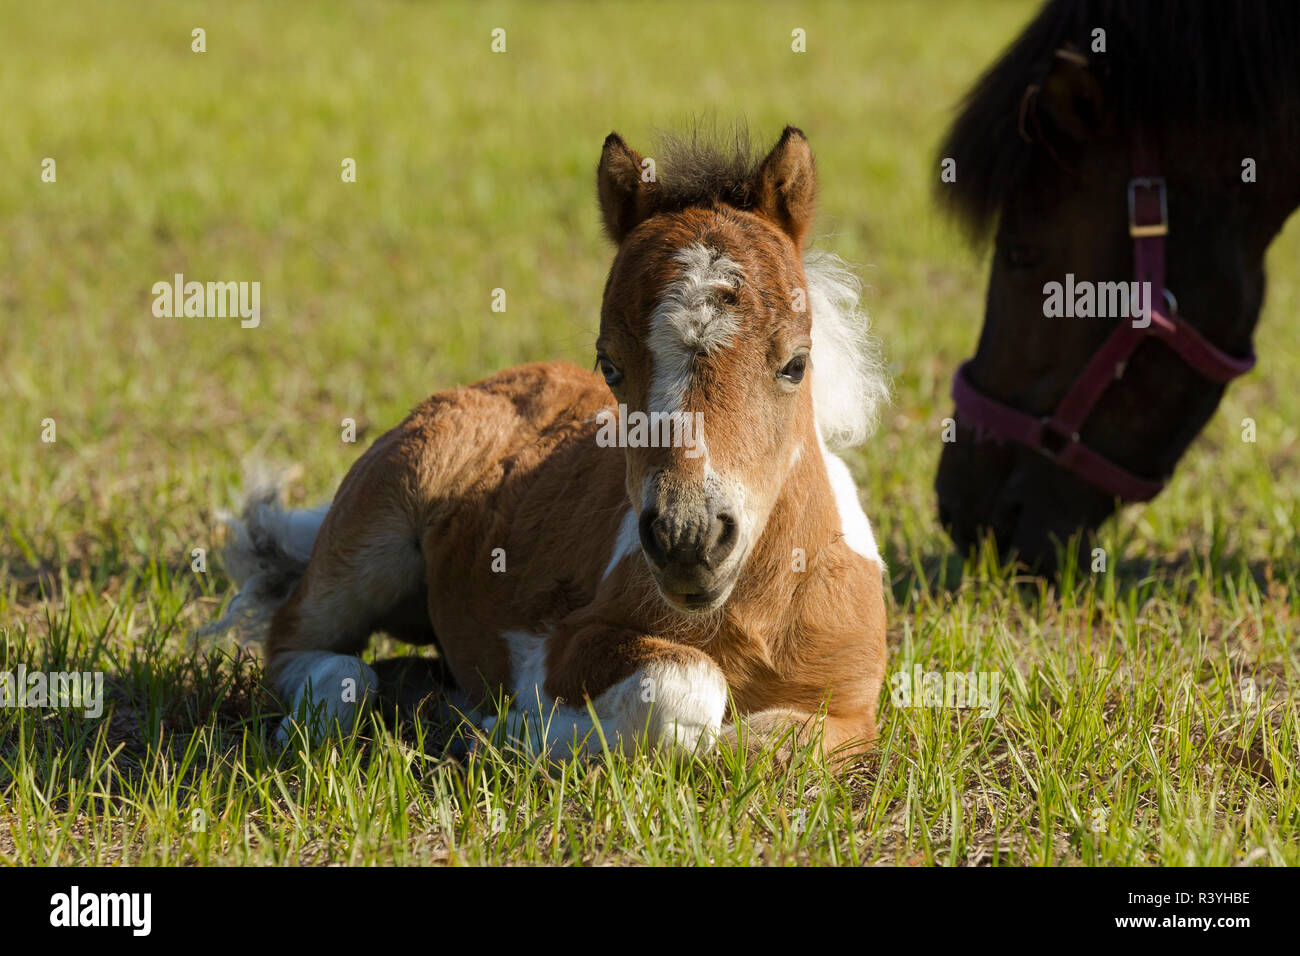 Baby Miniature Horse Paint Colt Stock Photo Alamy